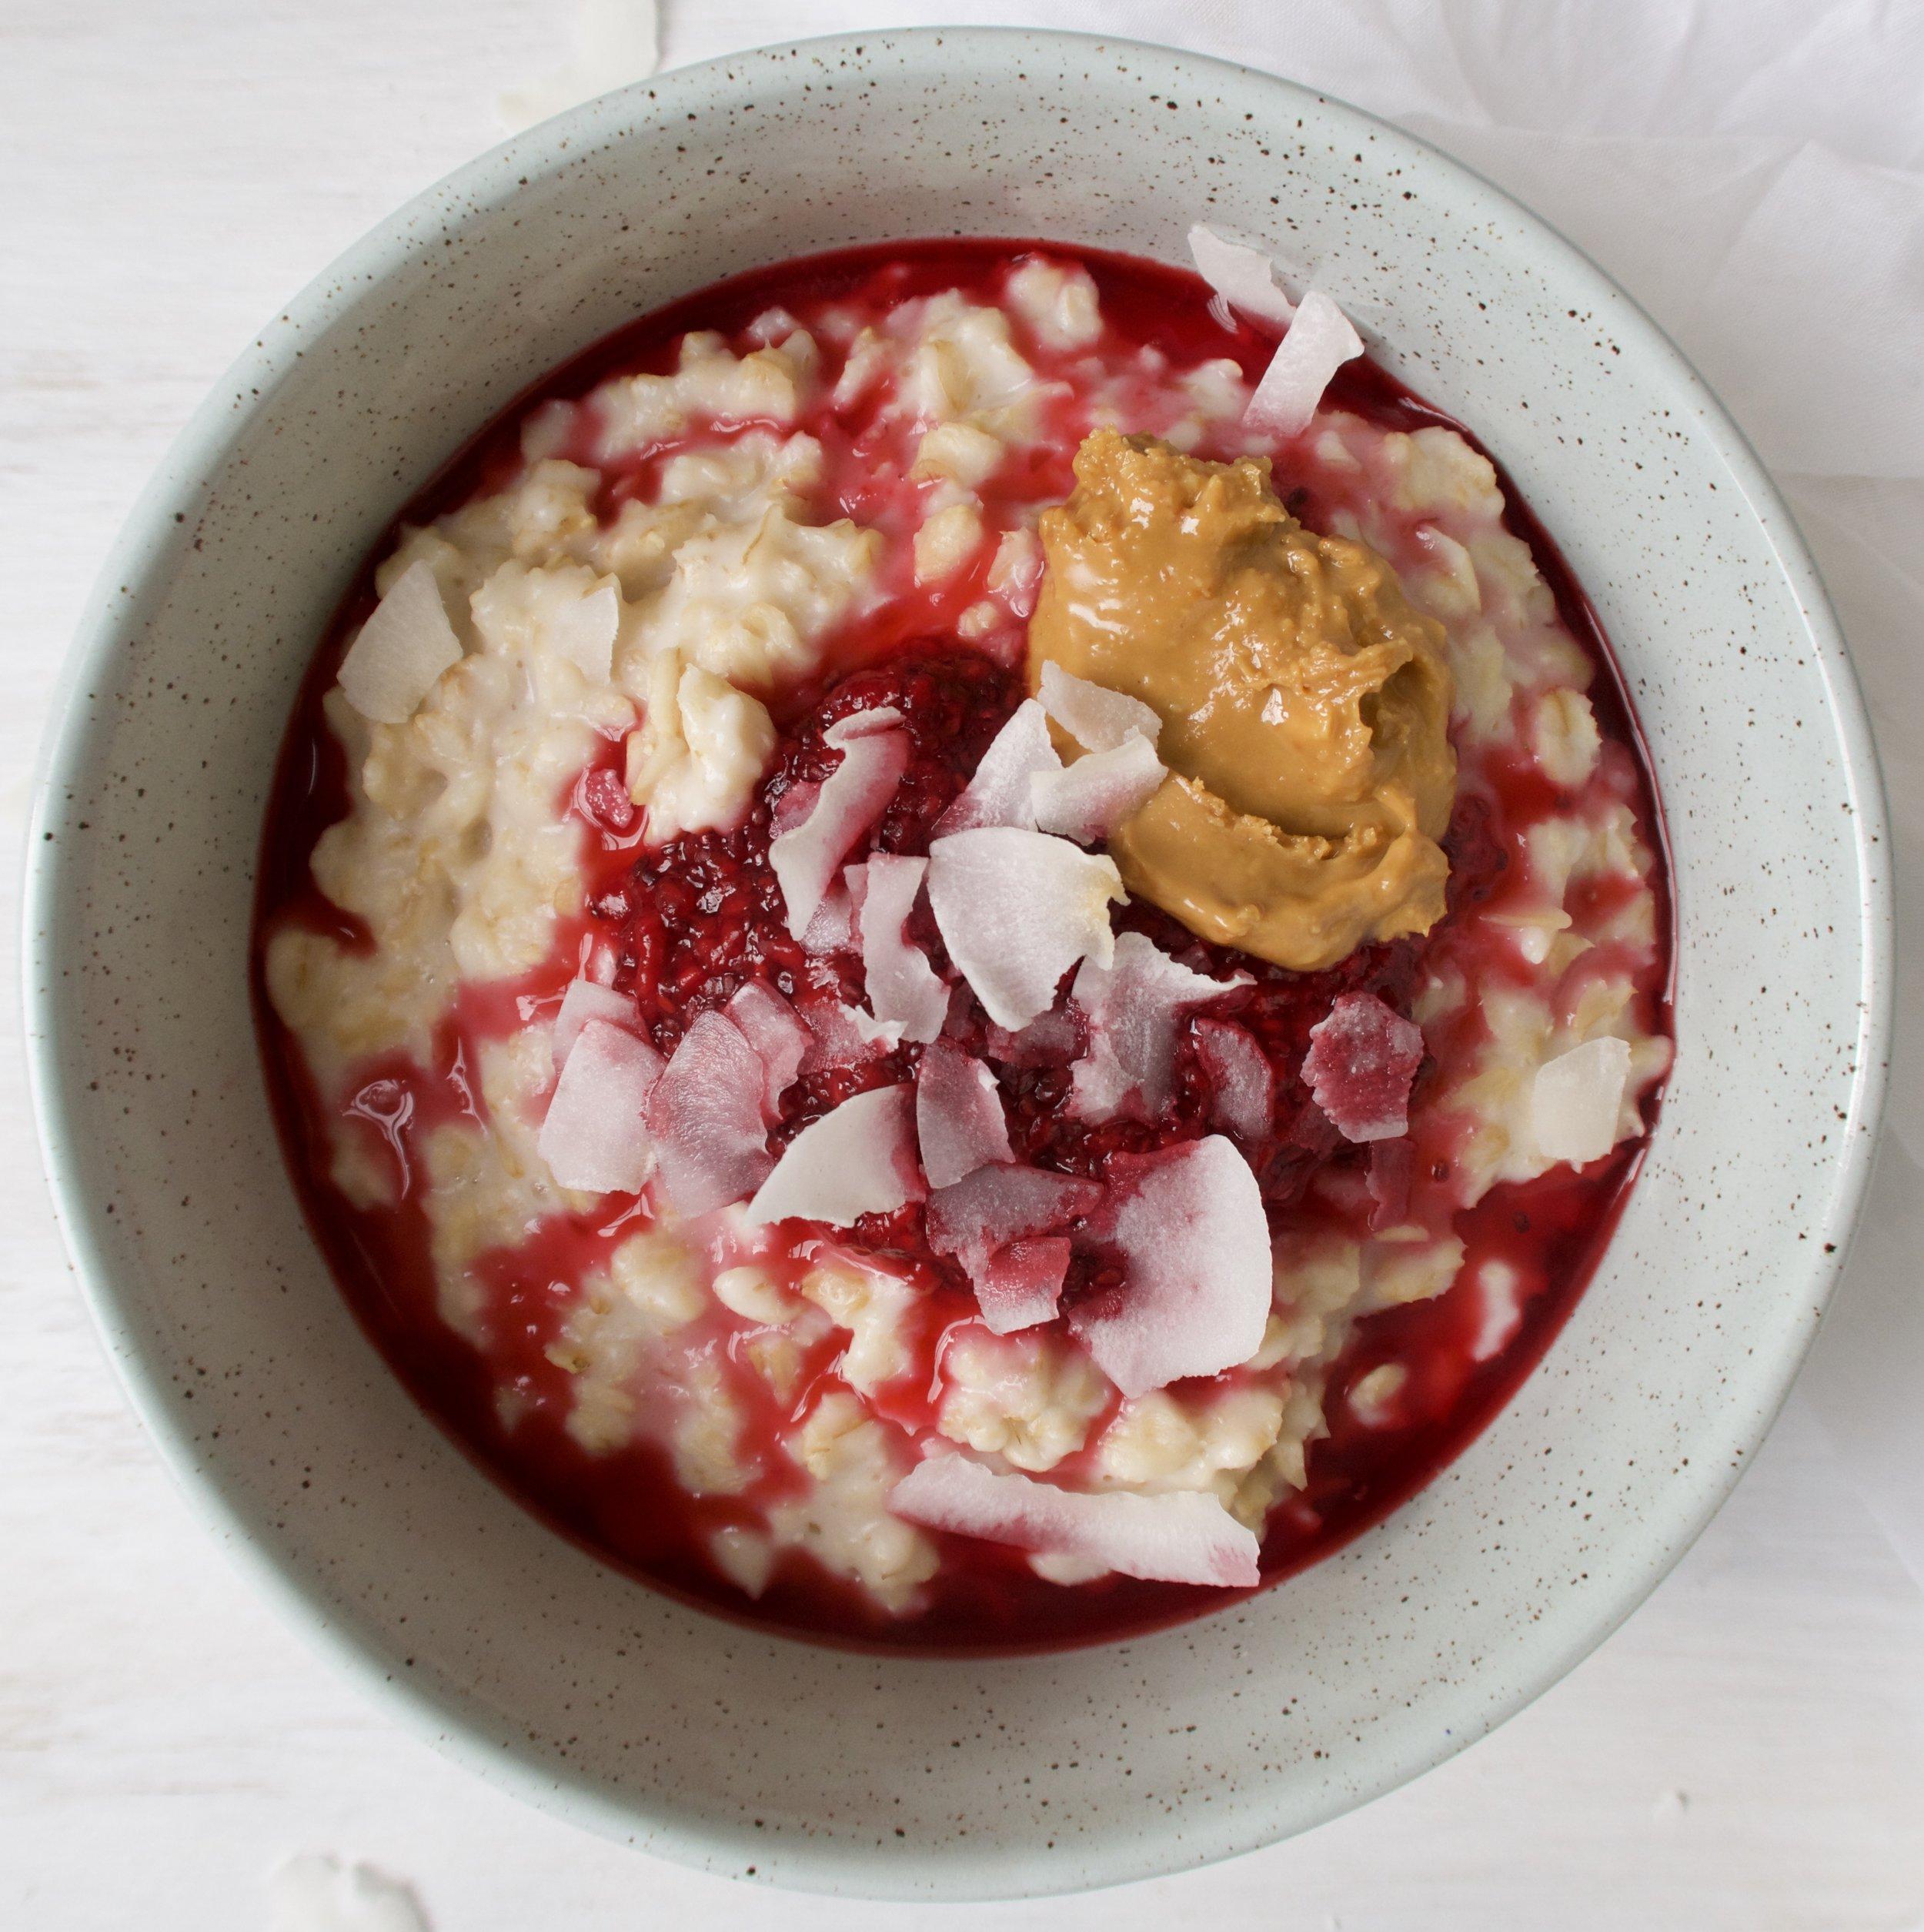 Raspberry and Peanut Butter Porridge